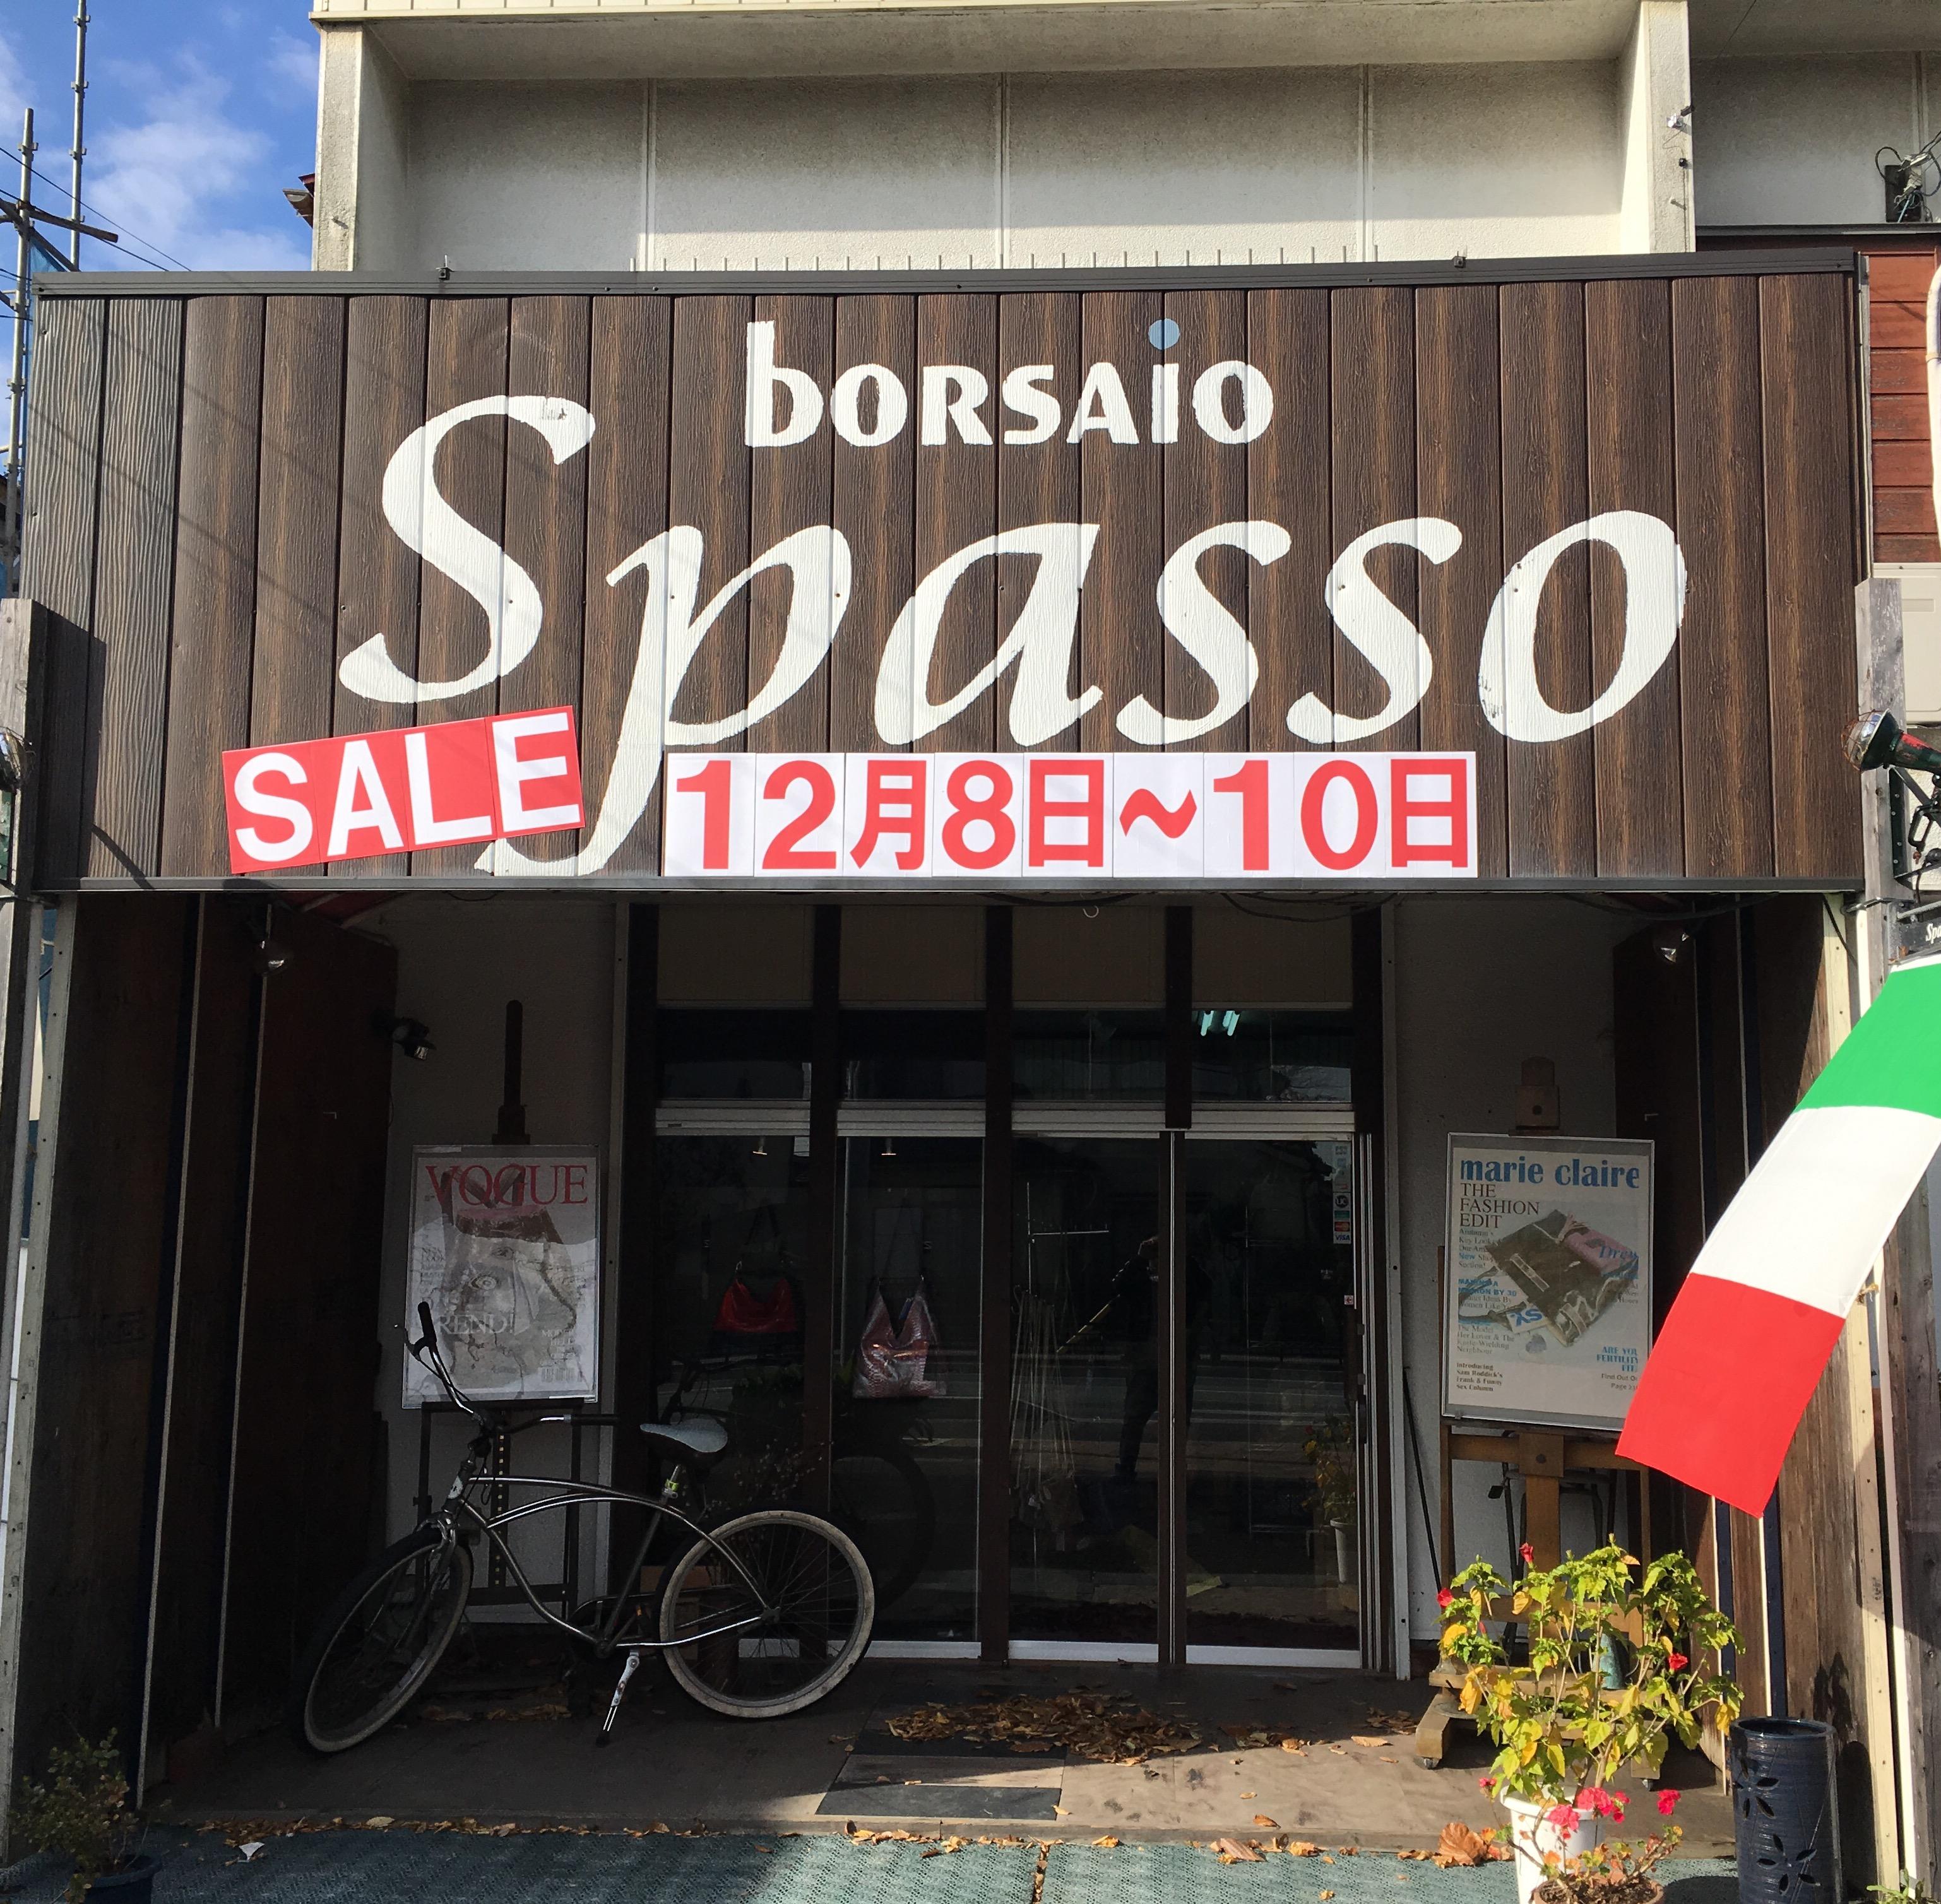 borsaio Spasso